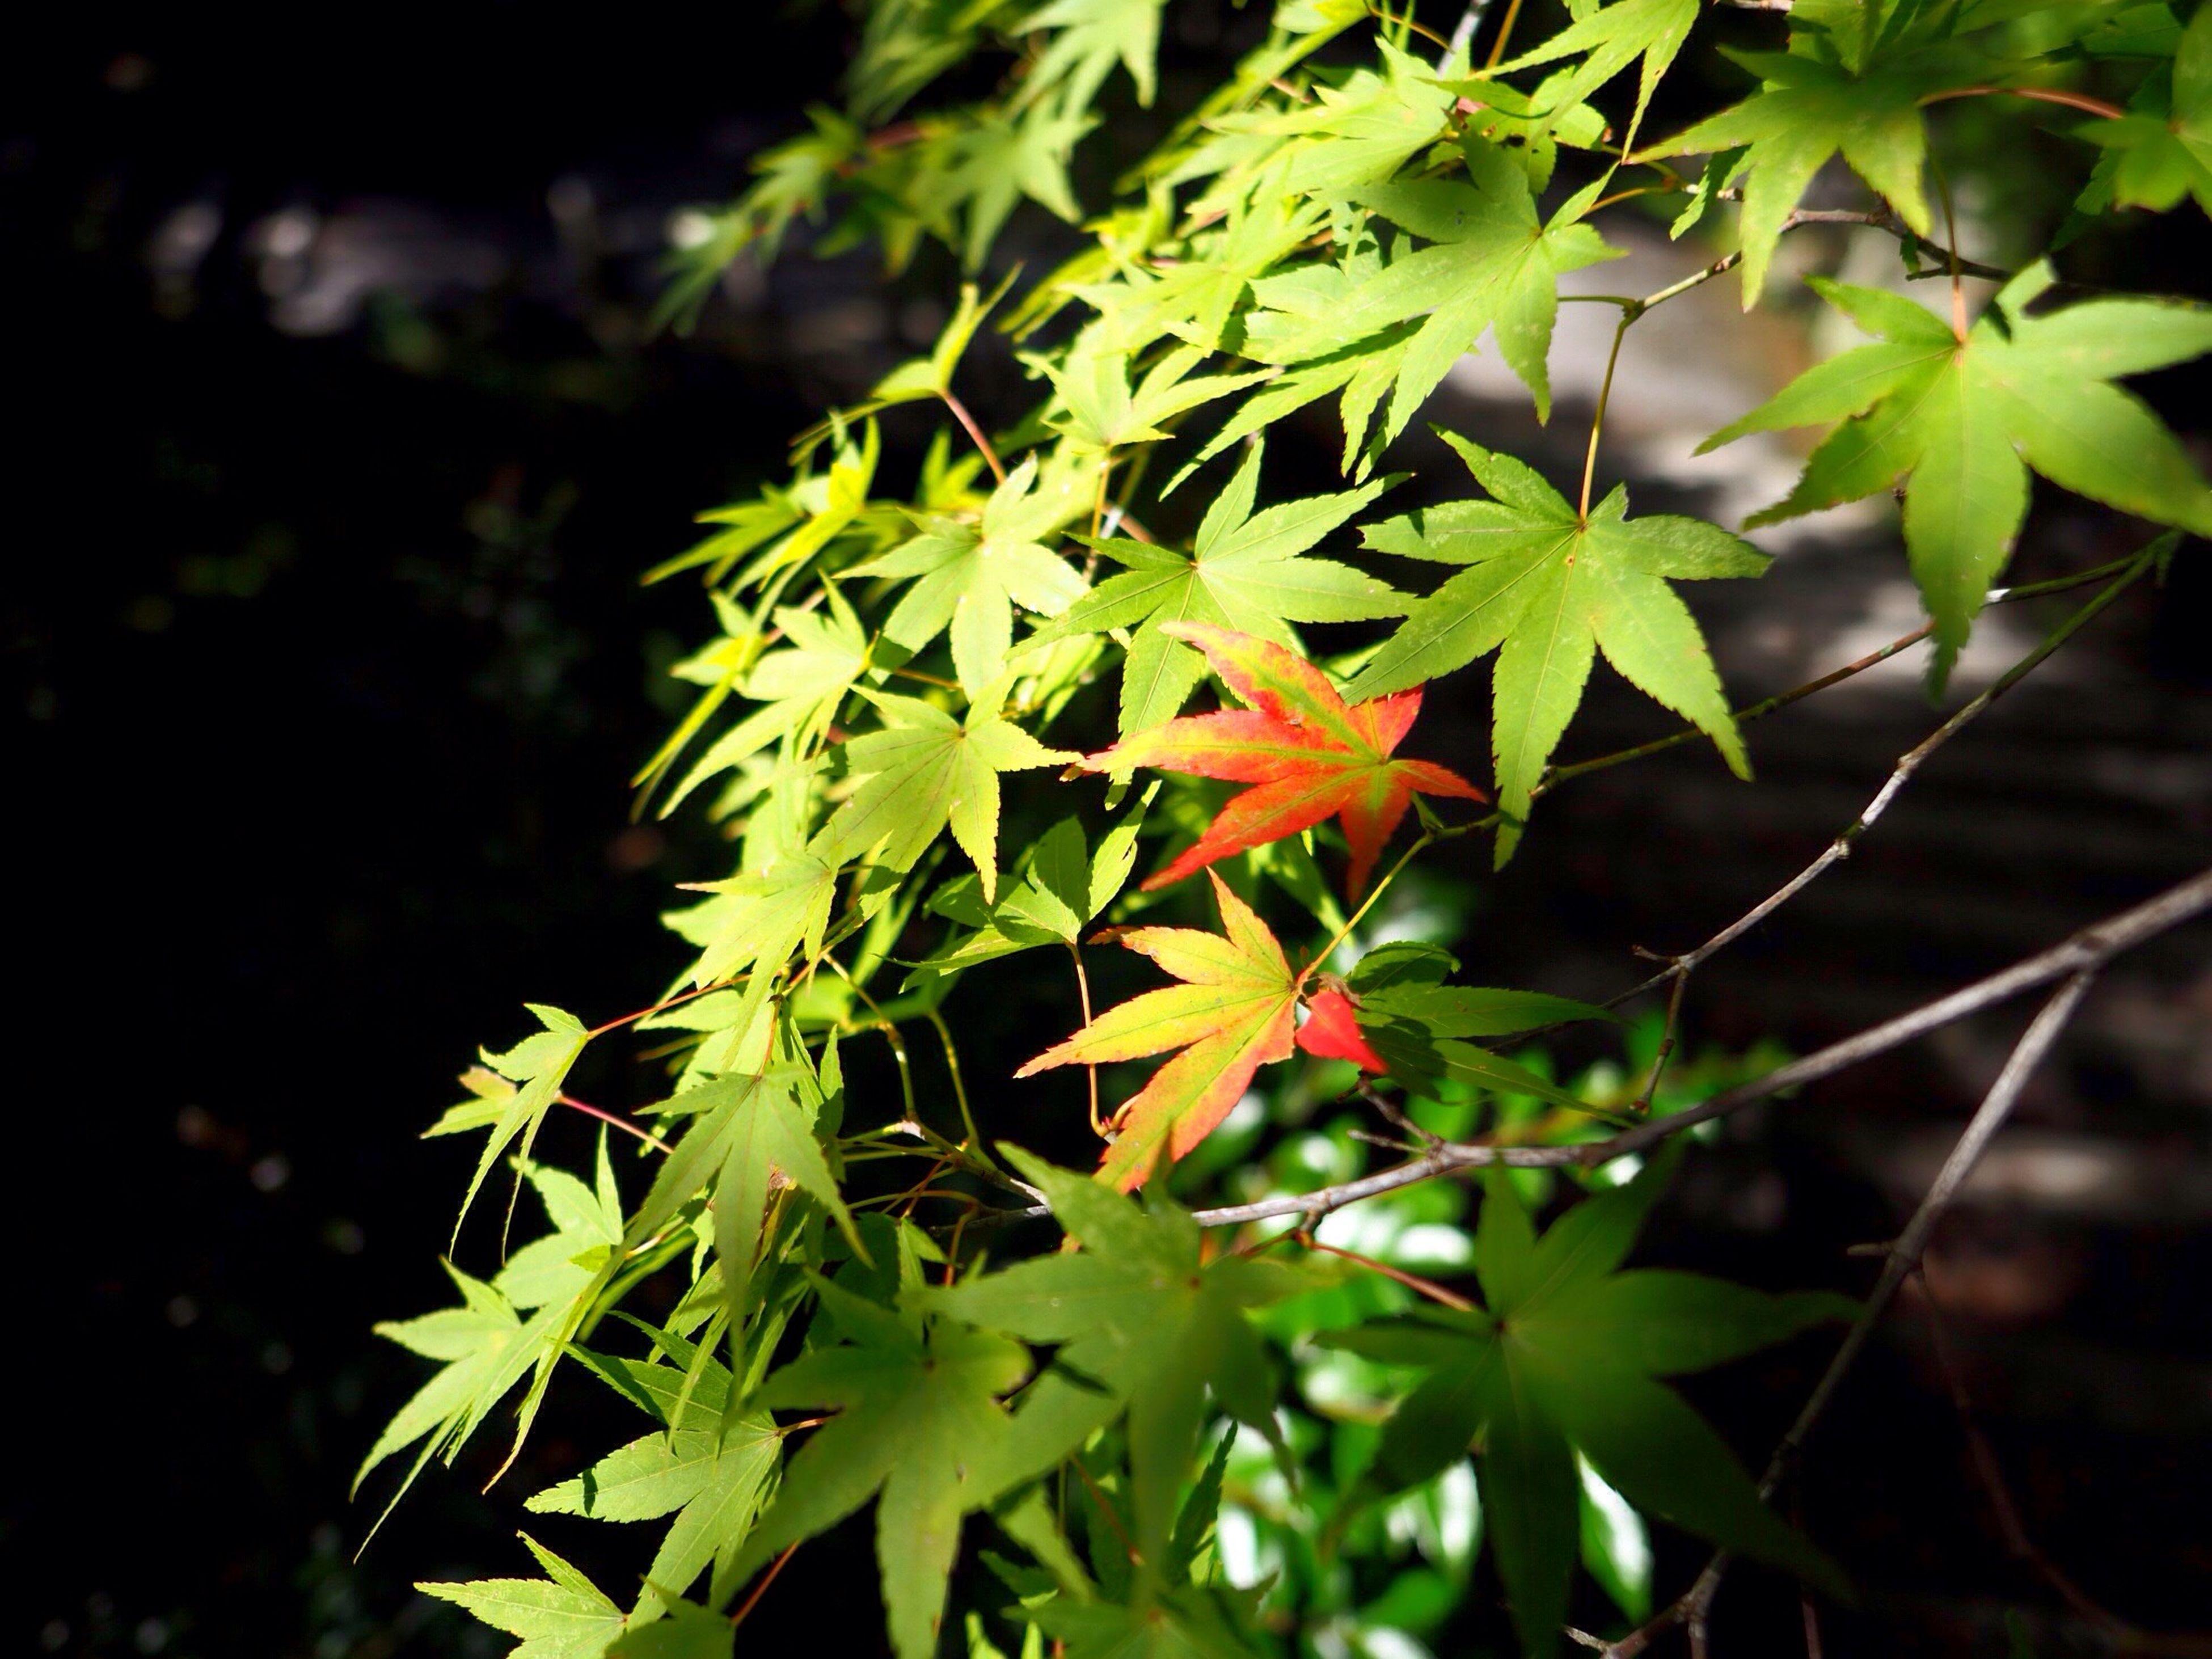 Kyoto Japan Leaves Beginning To Turn Red Tofukuji Tofukuji Temple Temple Green Red Autumn 京都 日本 紅葉の始まり 紅葉 東福寺 寺 緑 赤 Olympus PEN-F